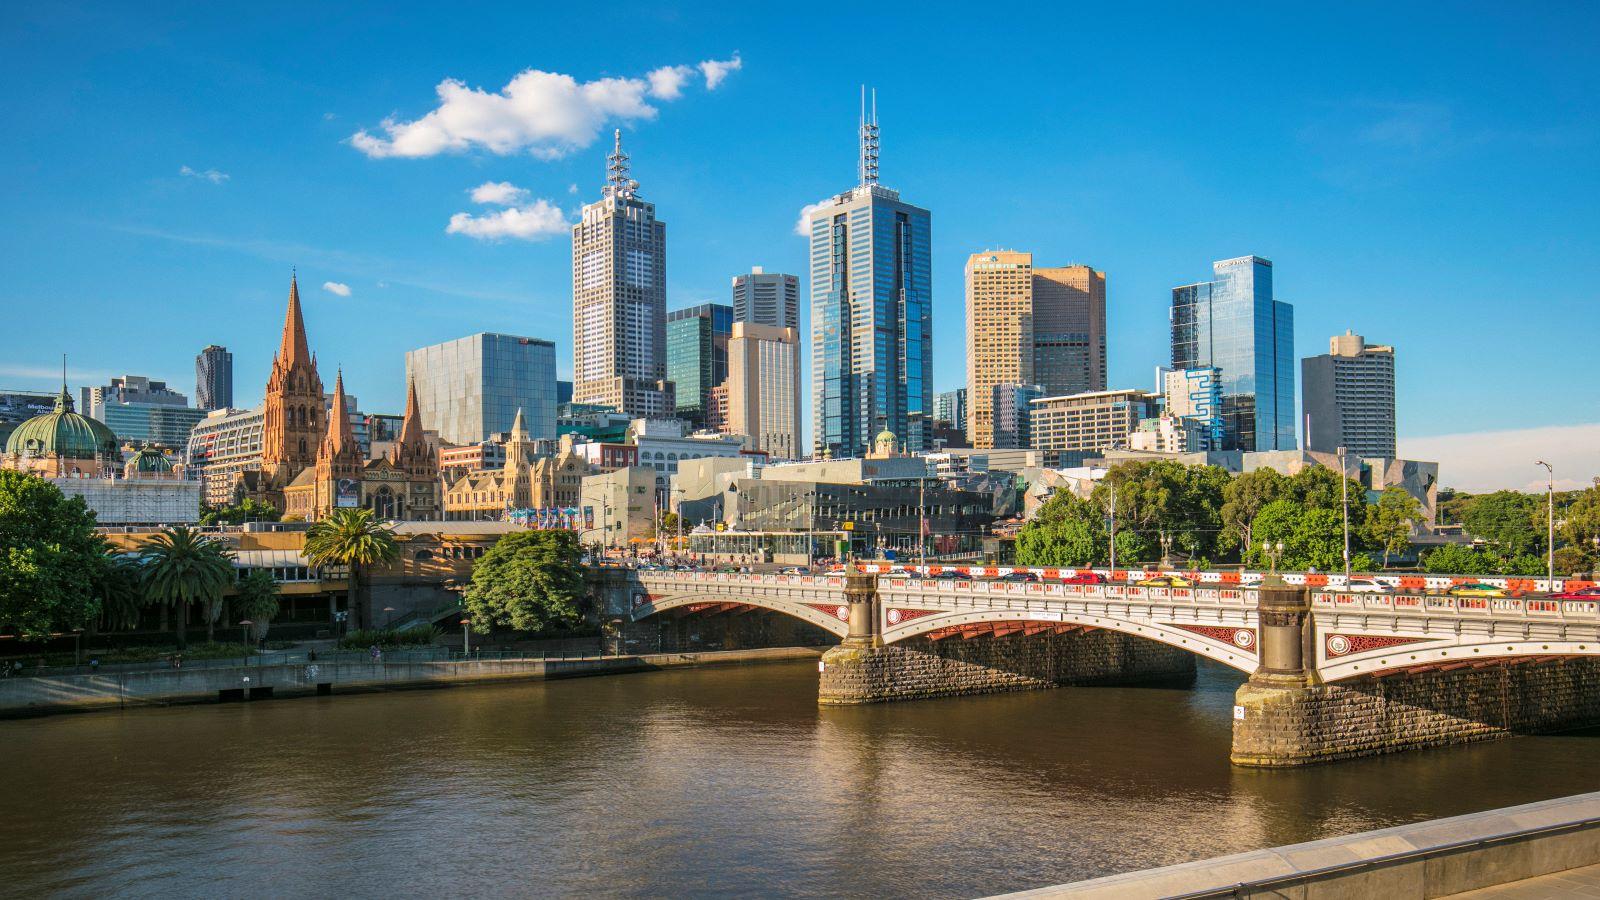 Melbourne central business district, Victoria, Australia